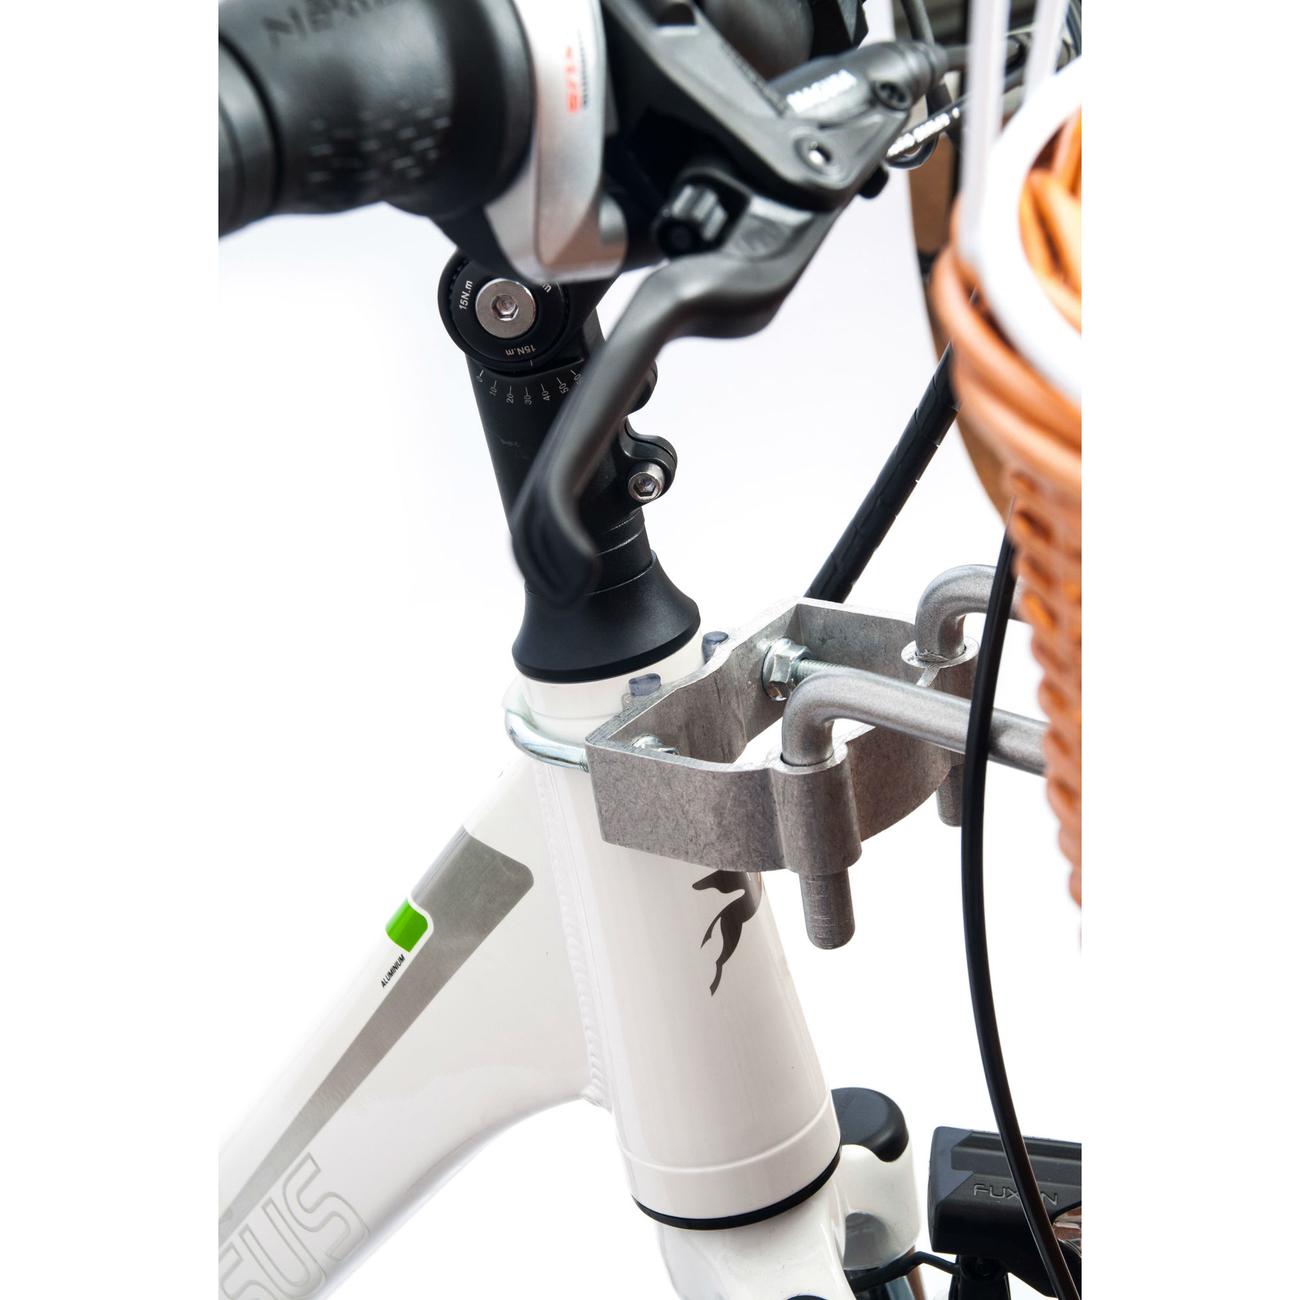 Aumüller E-Bike Hunde Fahrradkorb Standard vorne, Bild 12